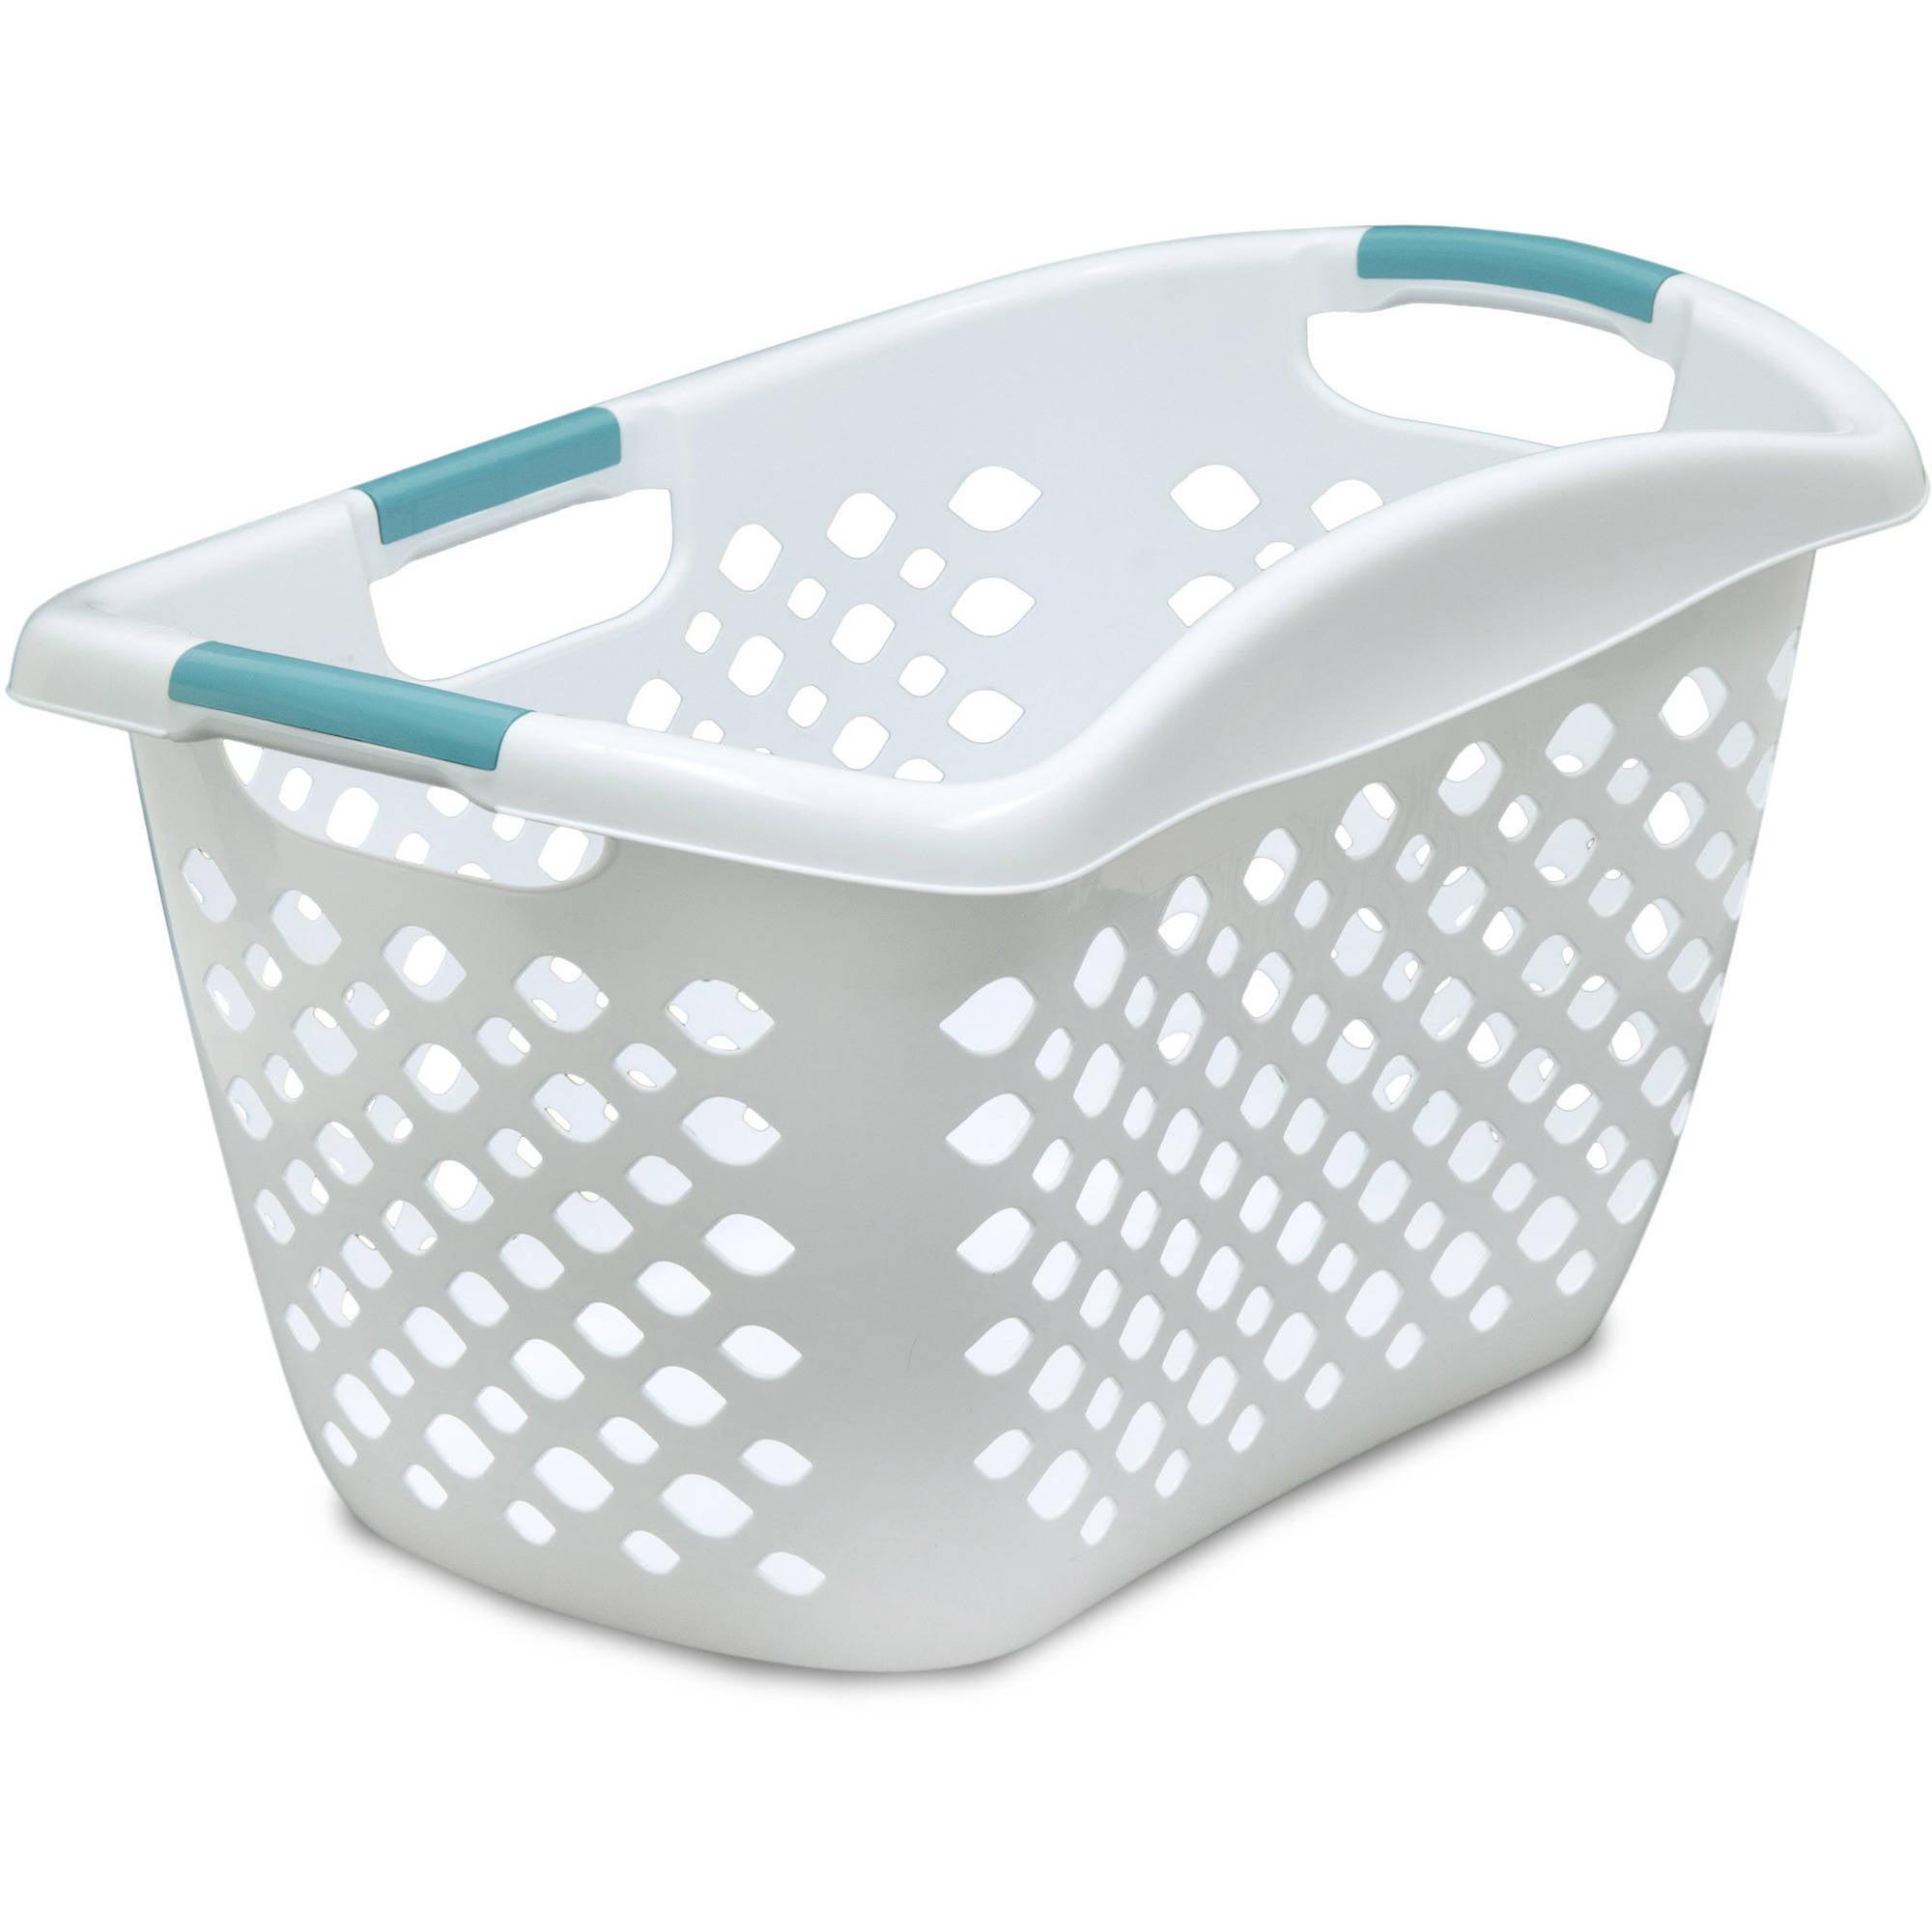 Home Logic 1.8-Bu Large Capacity HIP GRIP Laundry Basket